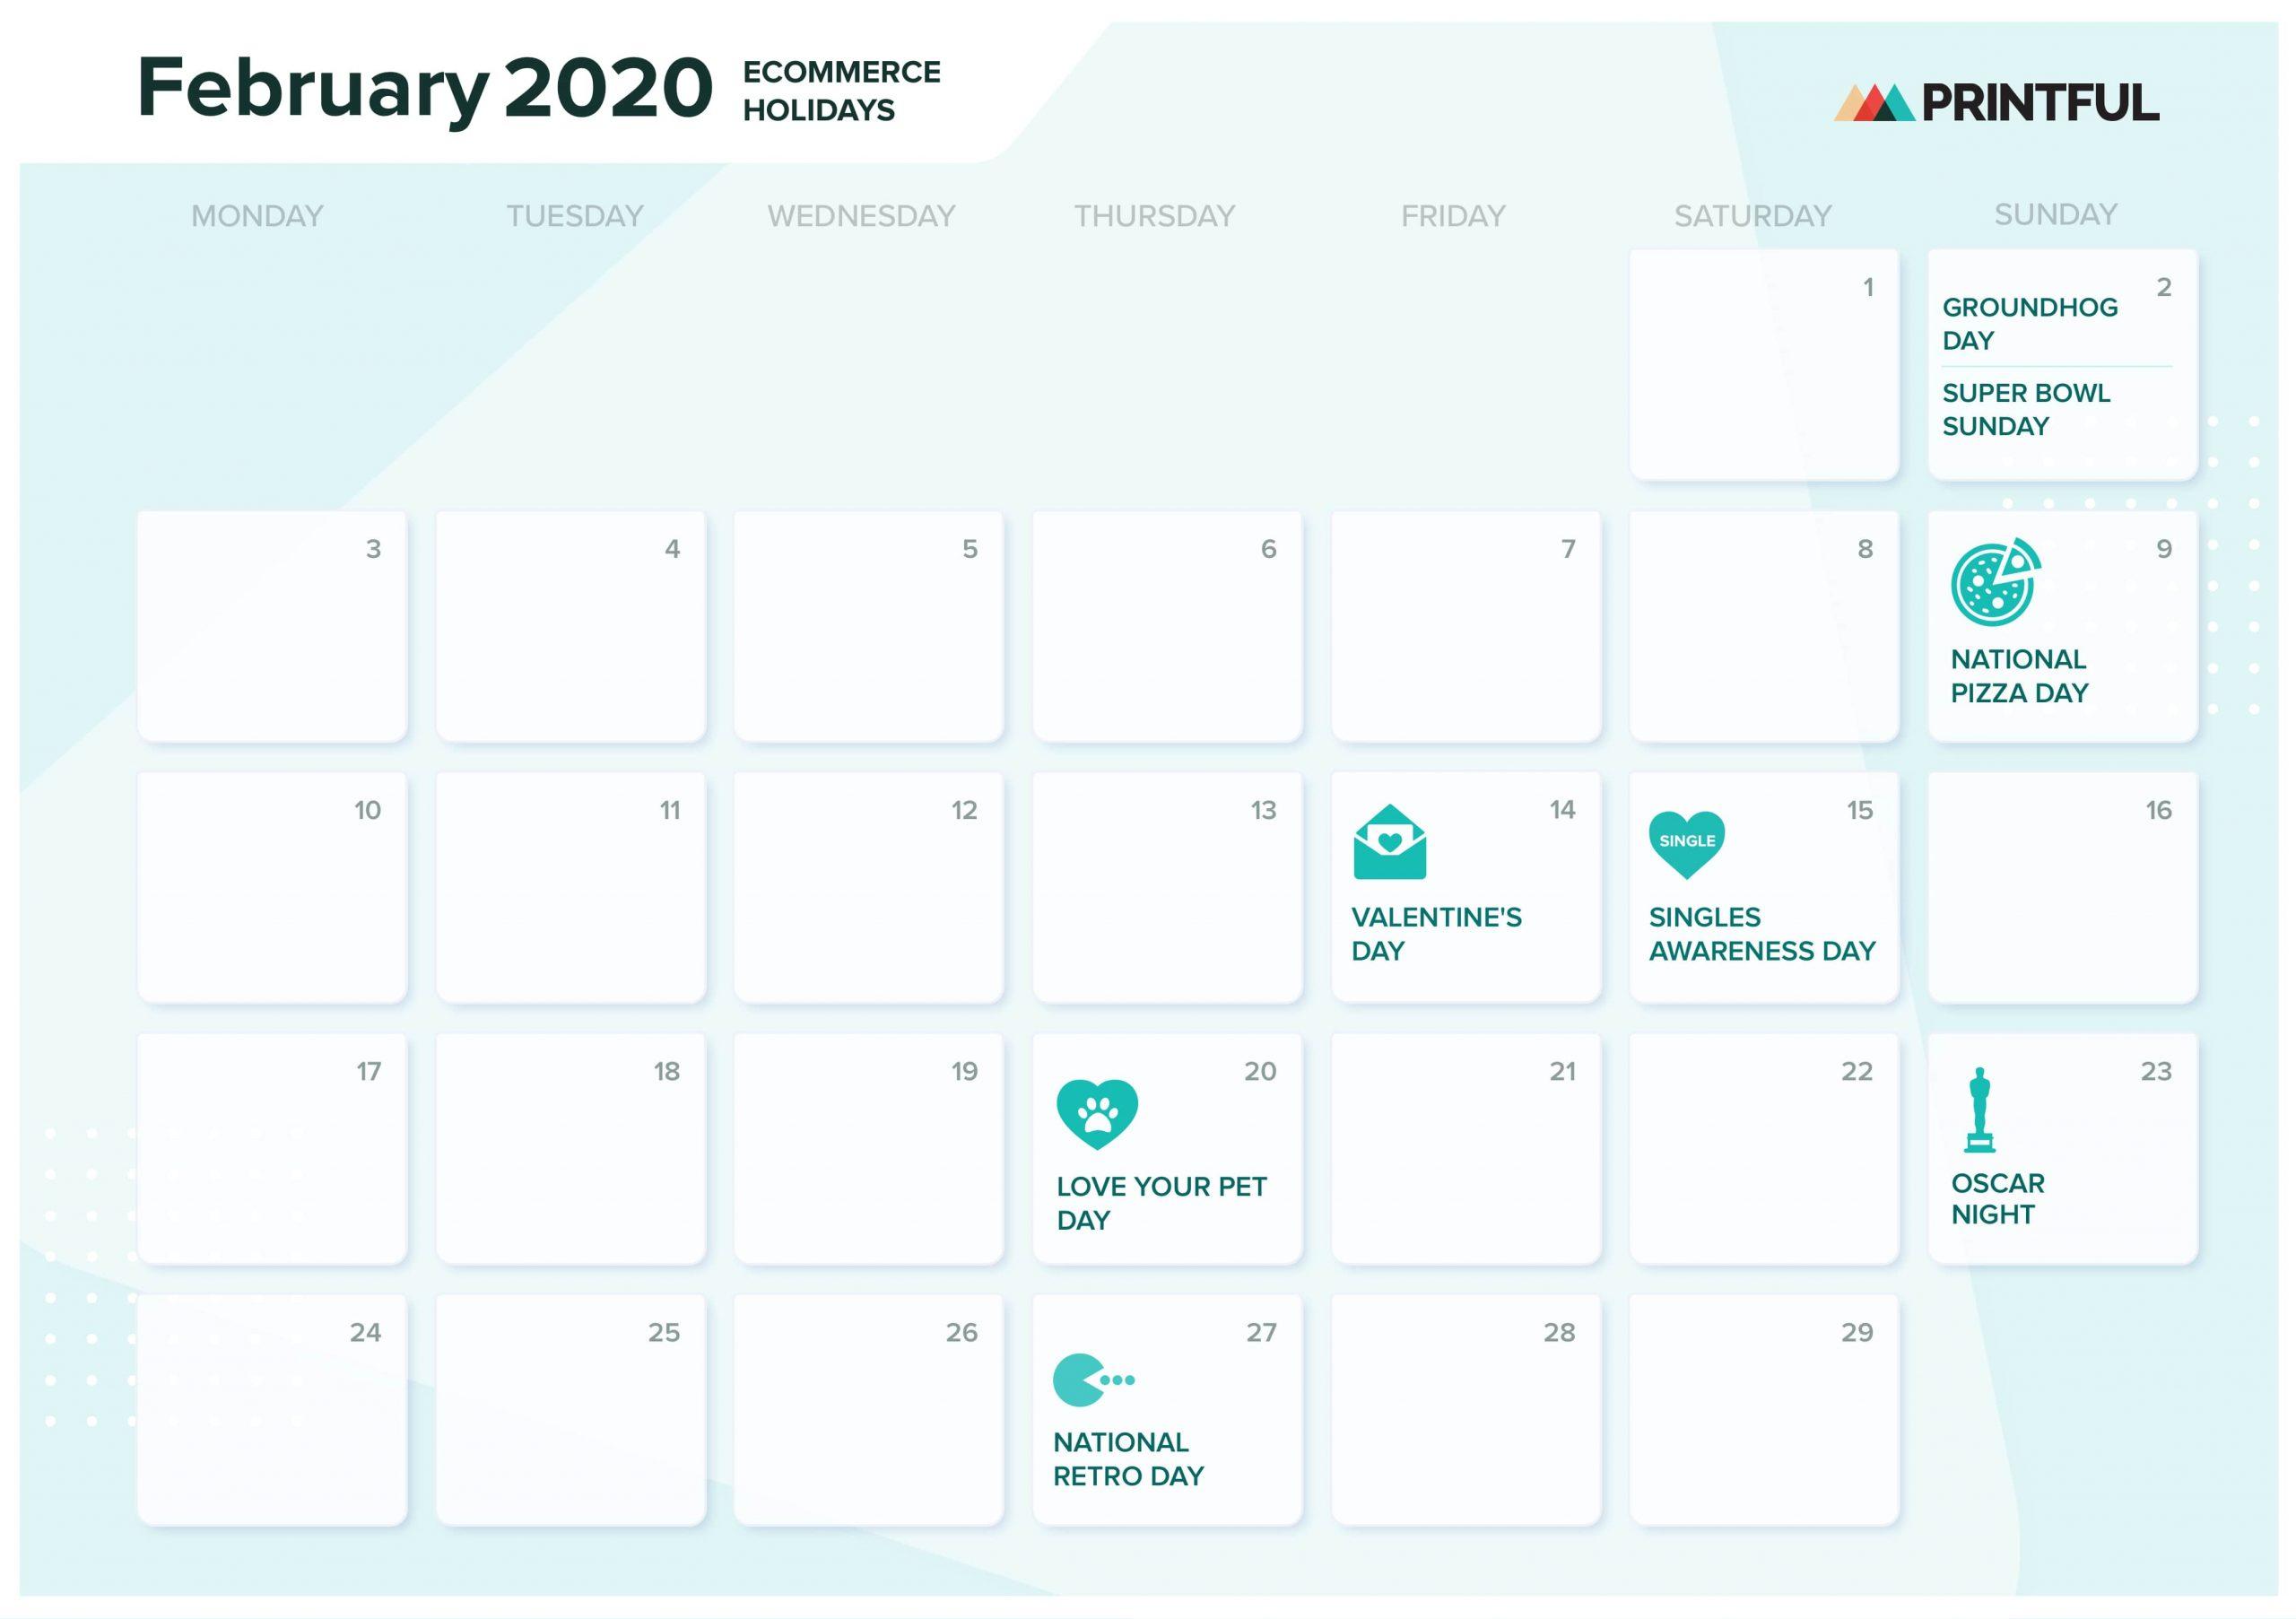 The Ultimate 2020 Ecommerce Holiday Marketing Calendar